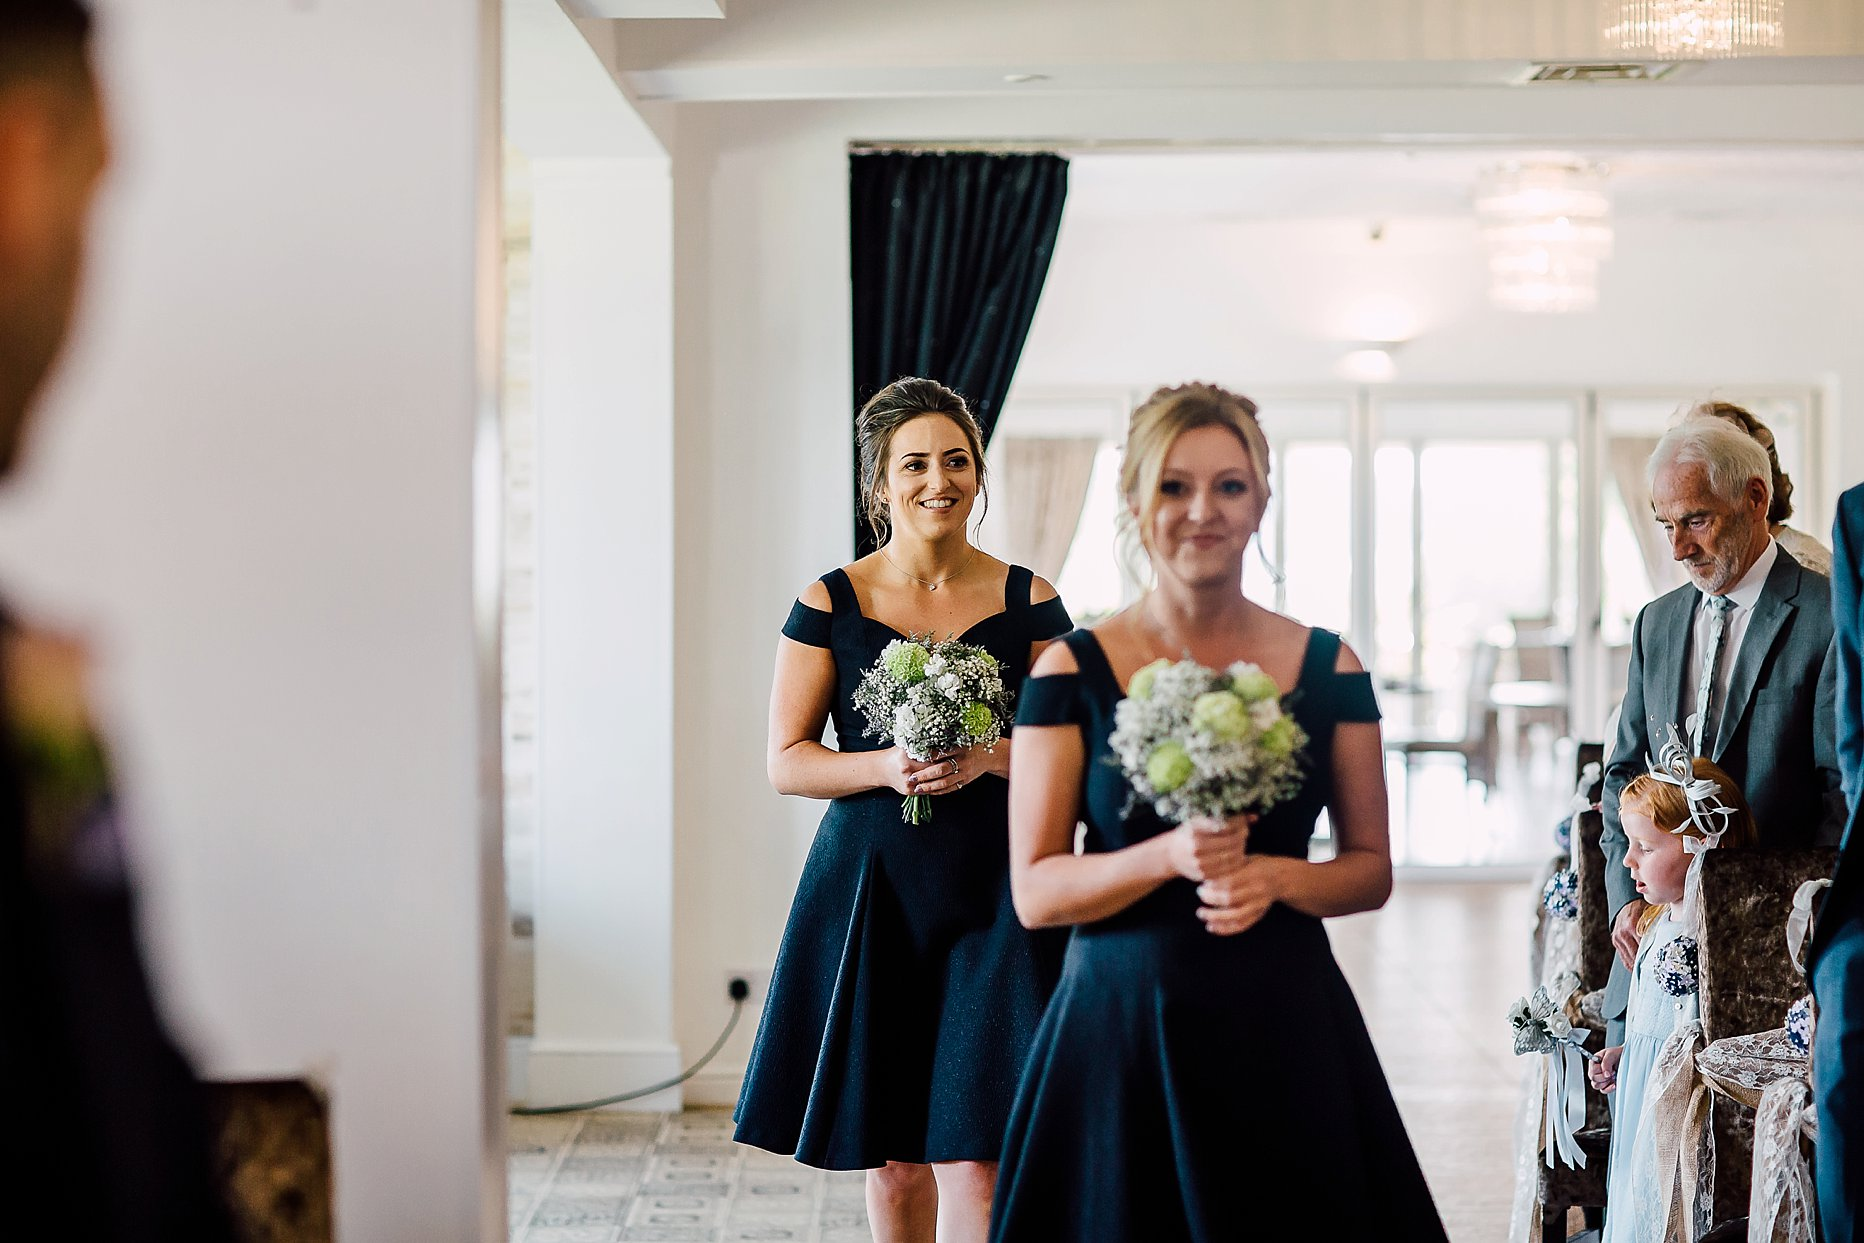 Lindsay Ellis Wedding.Skidby Mill Wedding Lindsay And Ellis 0031 Sarah Beth Photo